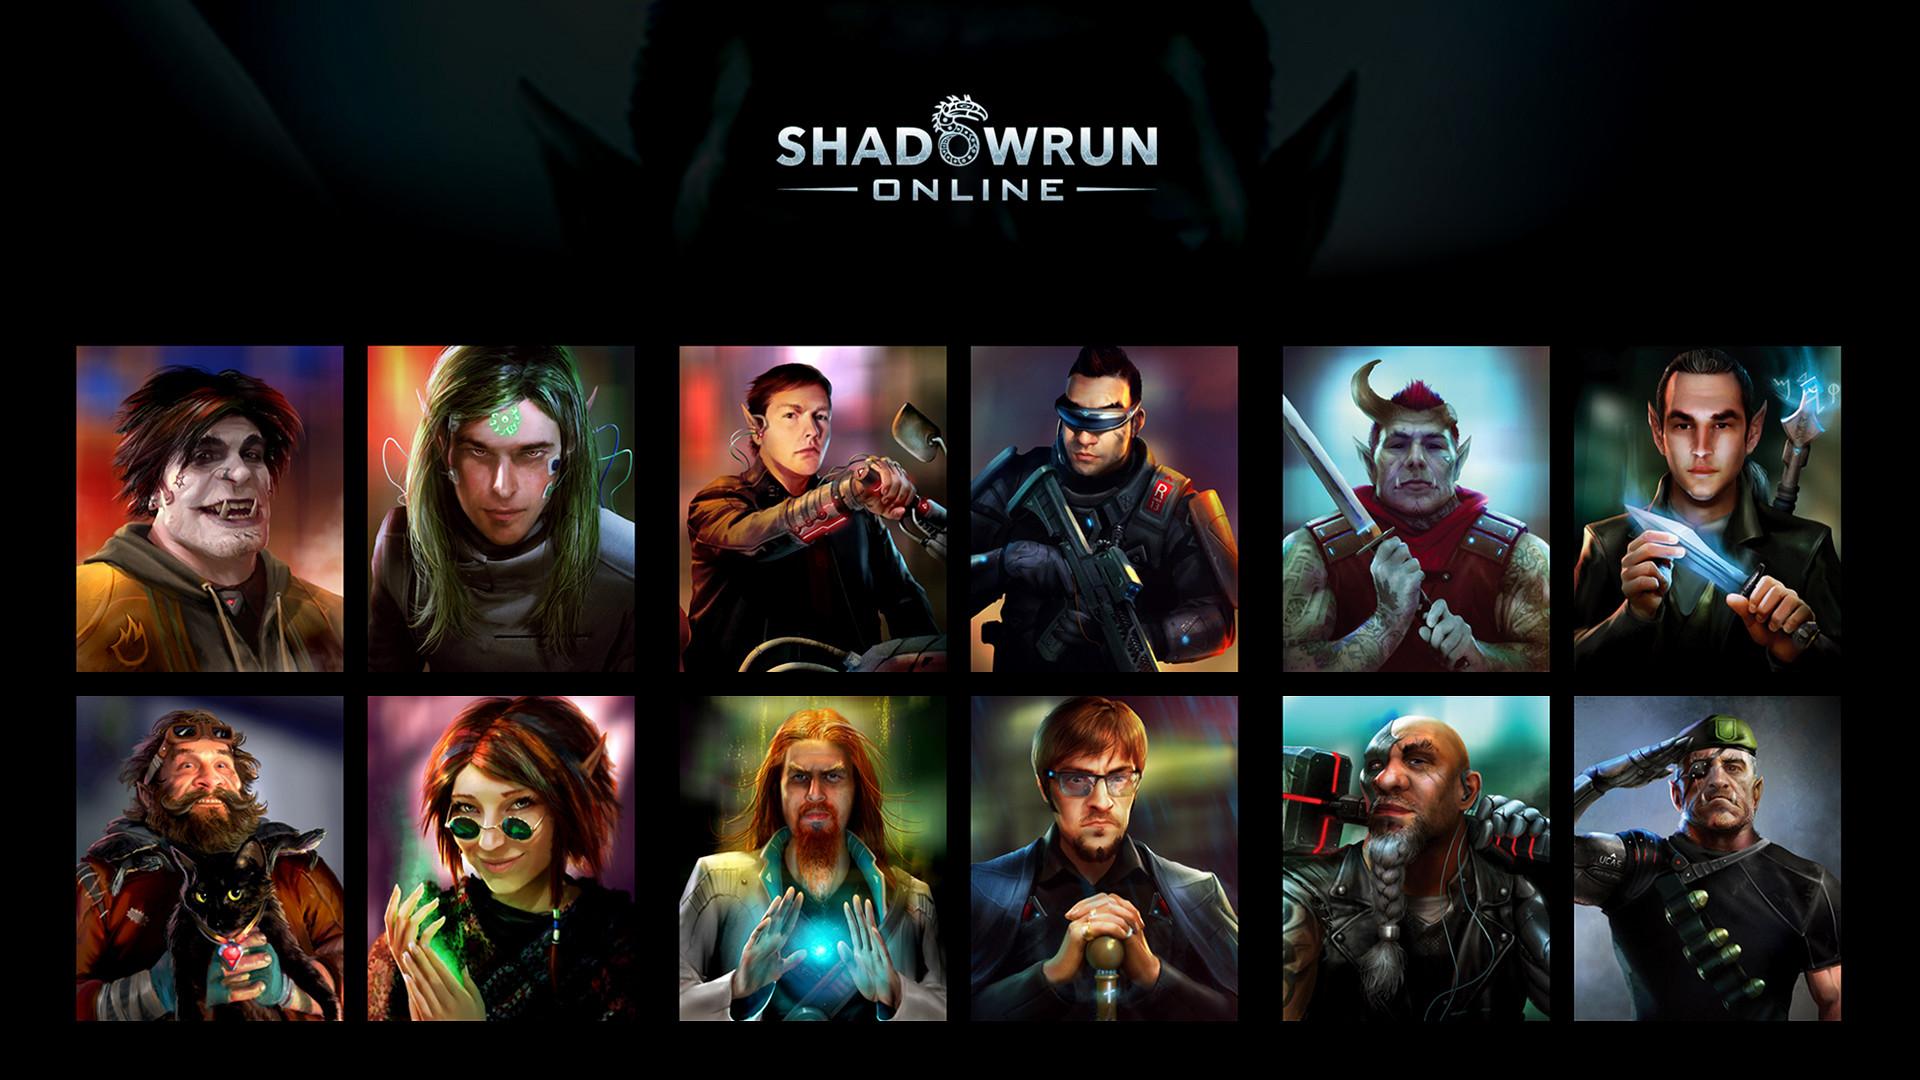 shadowrun mural.jpg757 KB